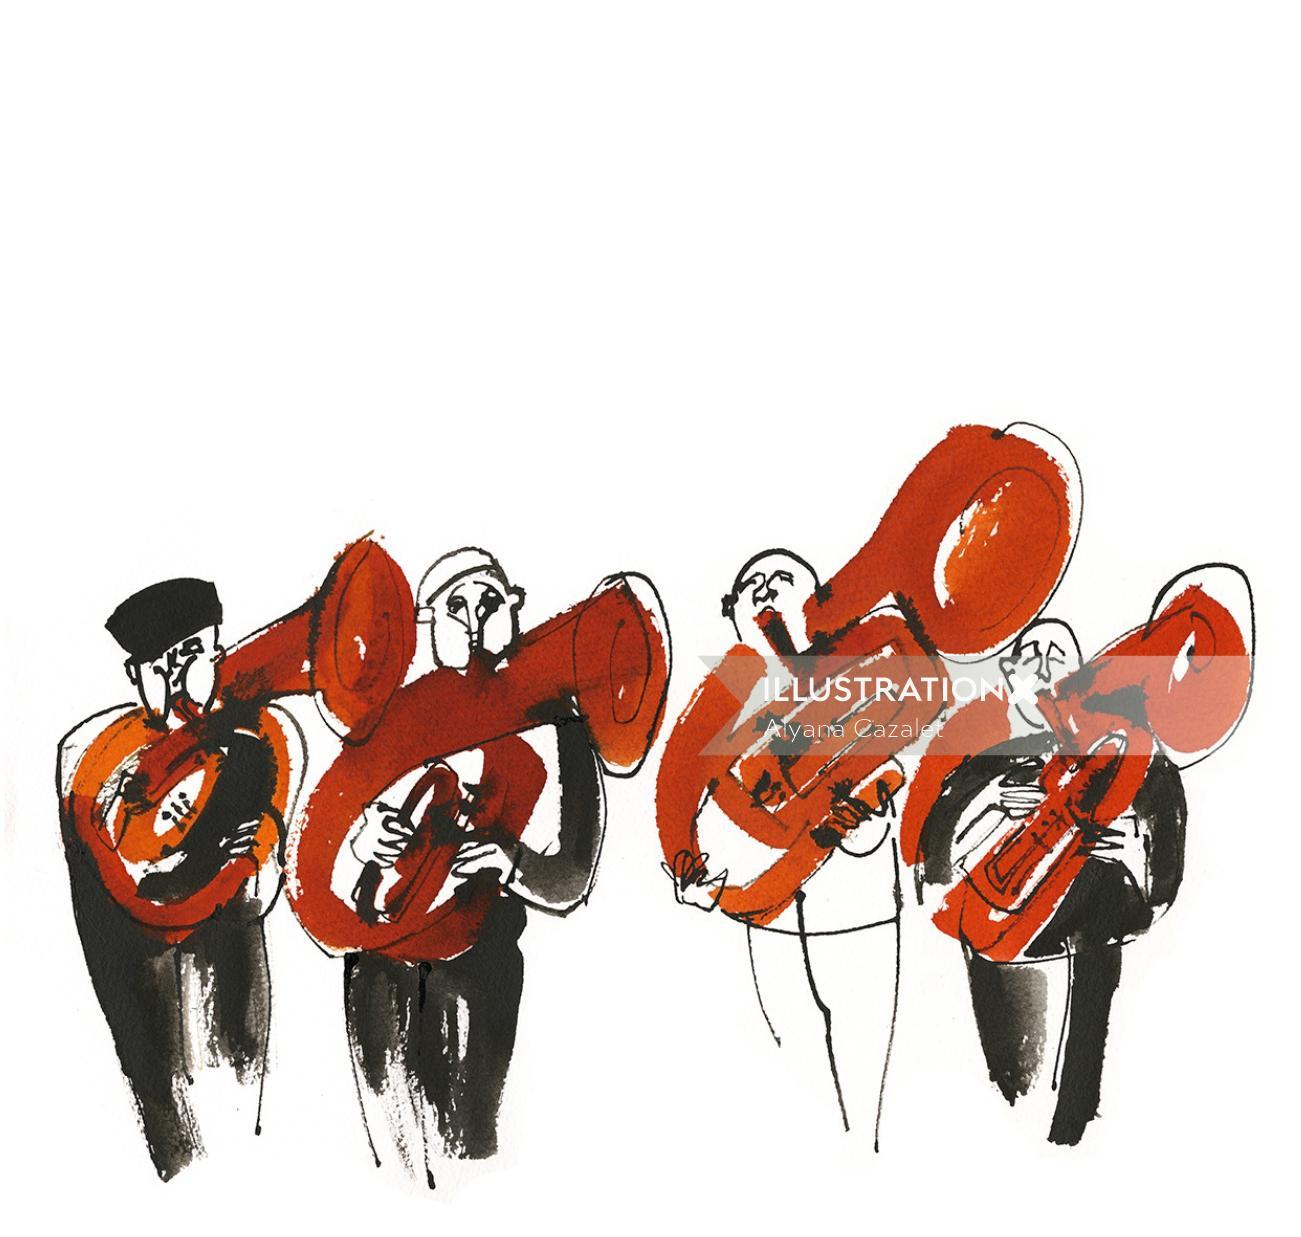 French horn players illustration by Alyana Cazalet